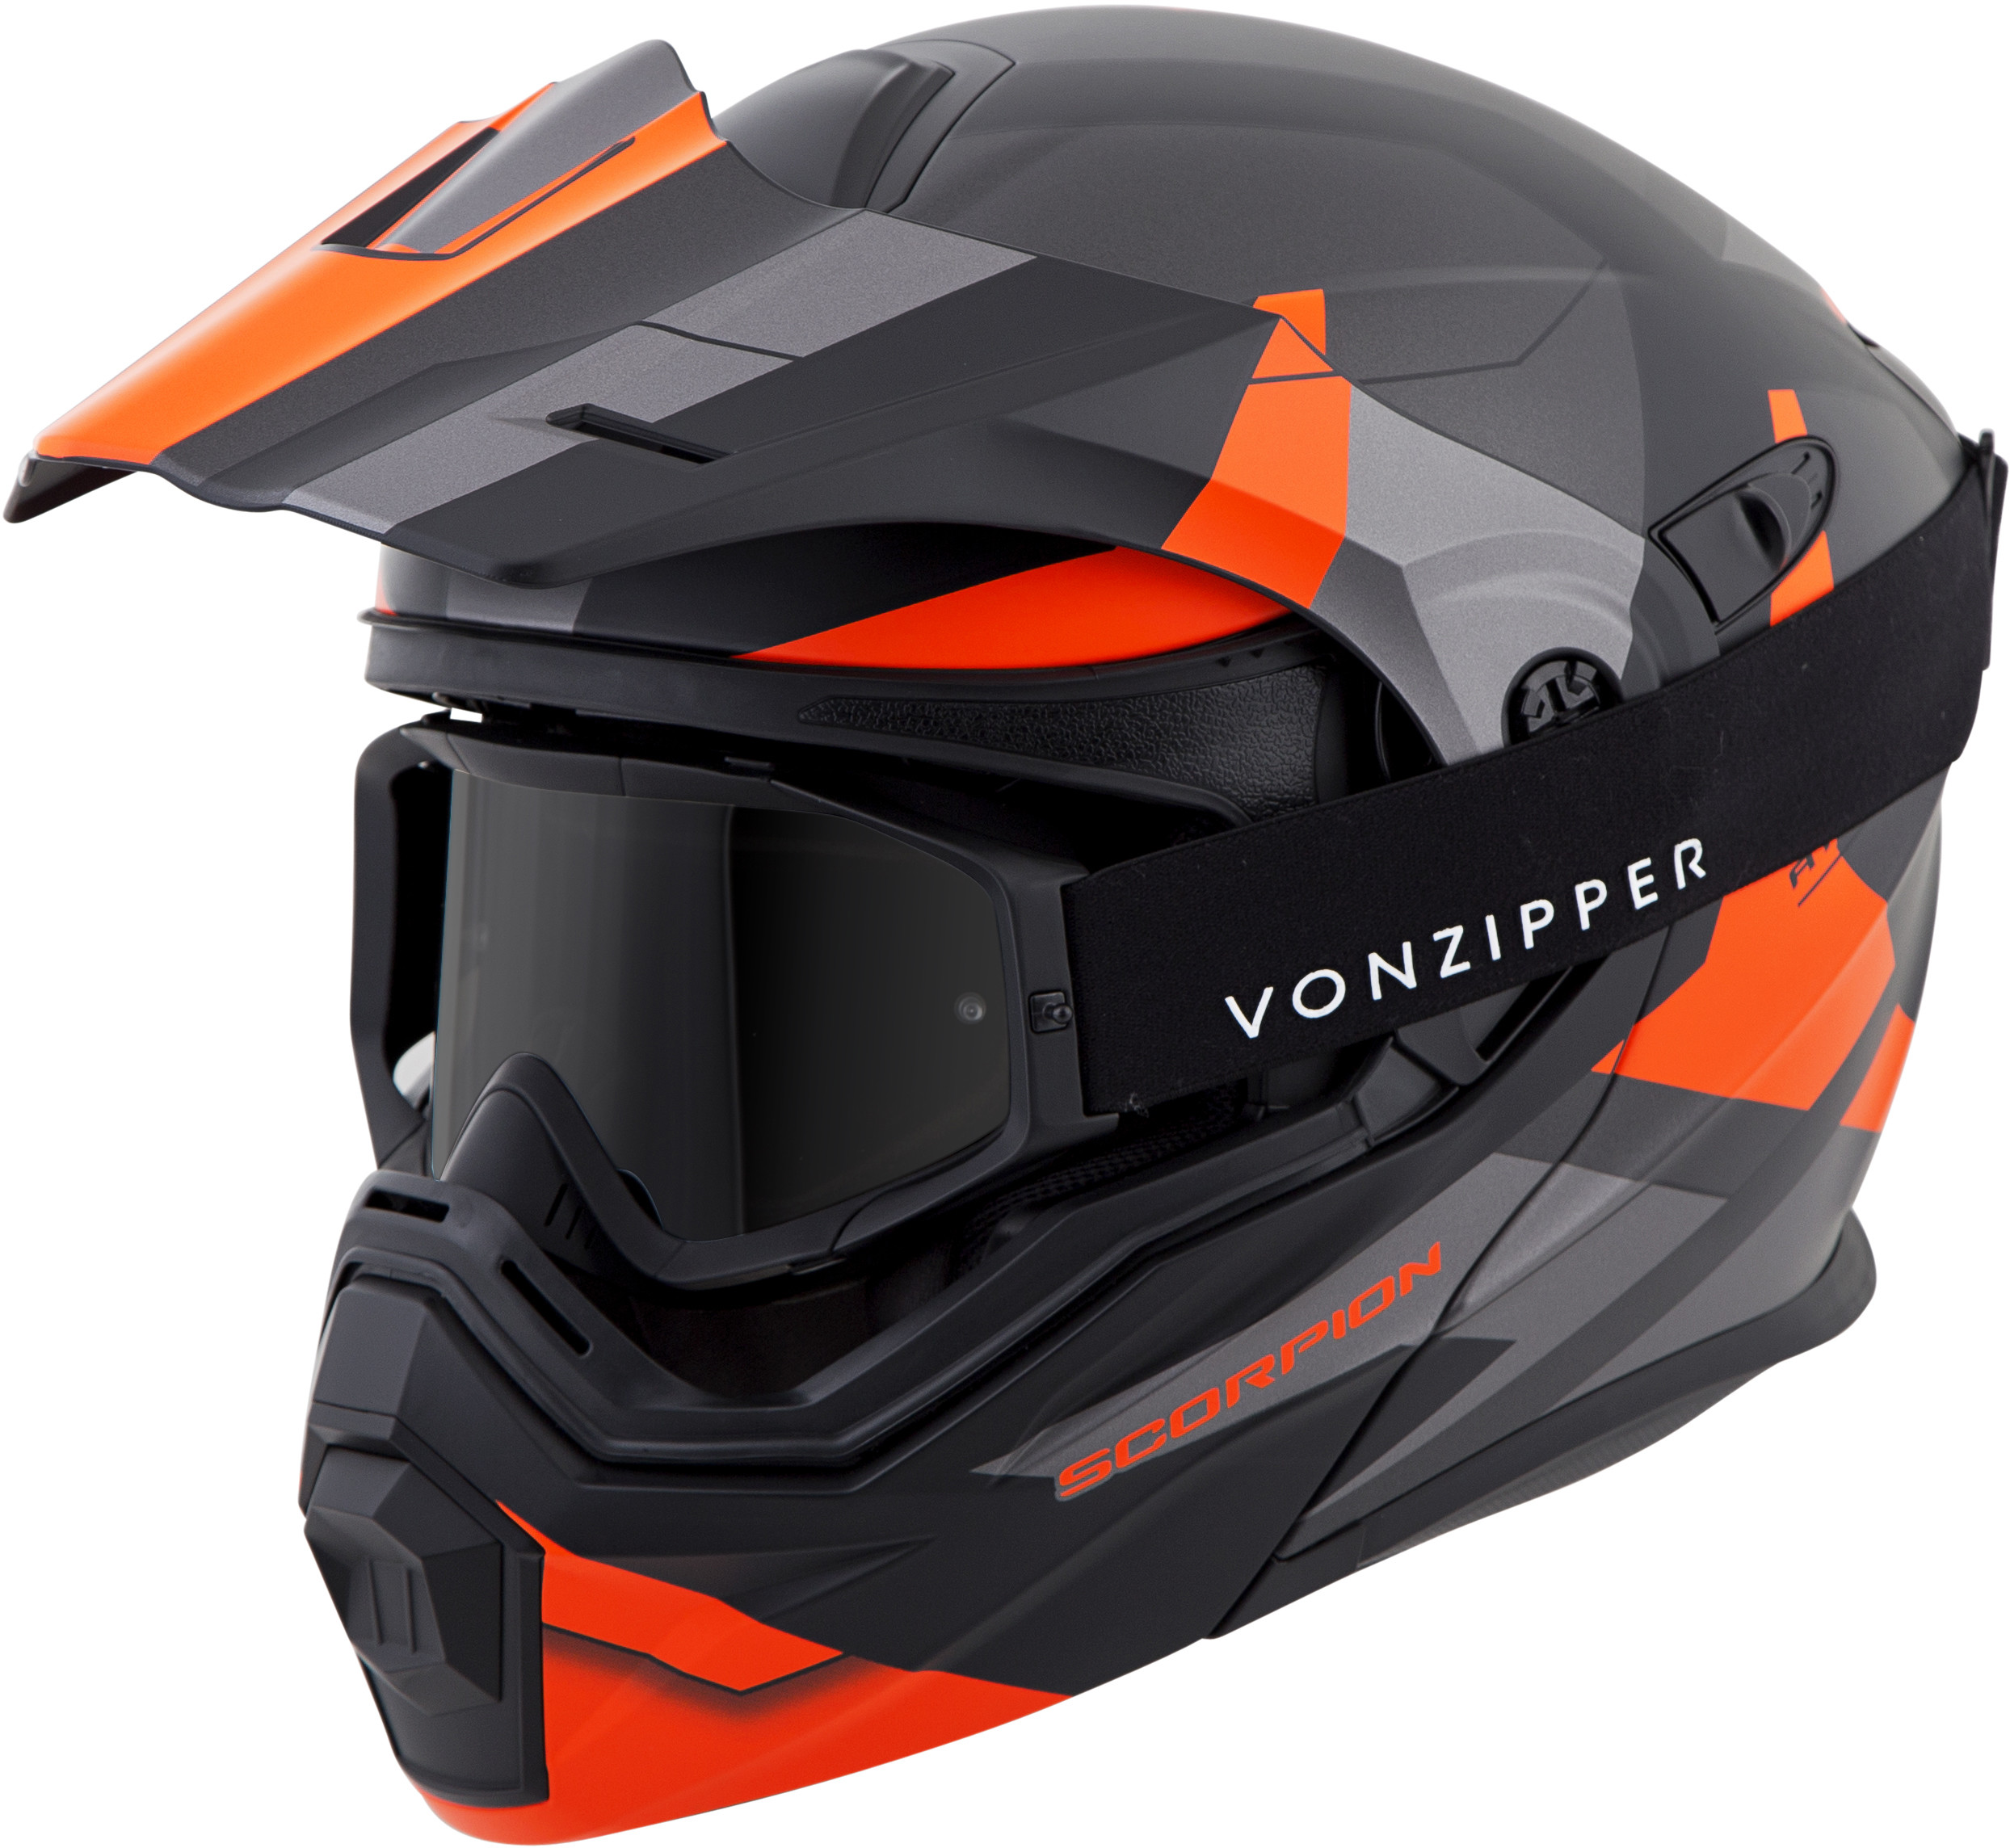 for-Scorpion-Helmet-EXO-AT950-Neocon-Snow-Helmet-with-Dual-Lens-Shield miniature 13